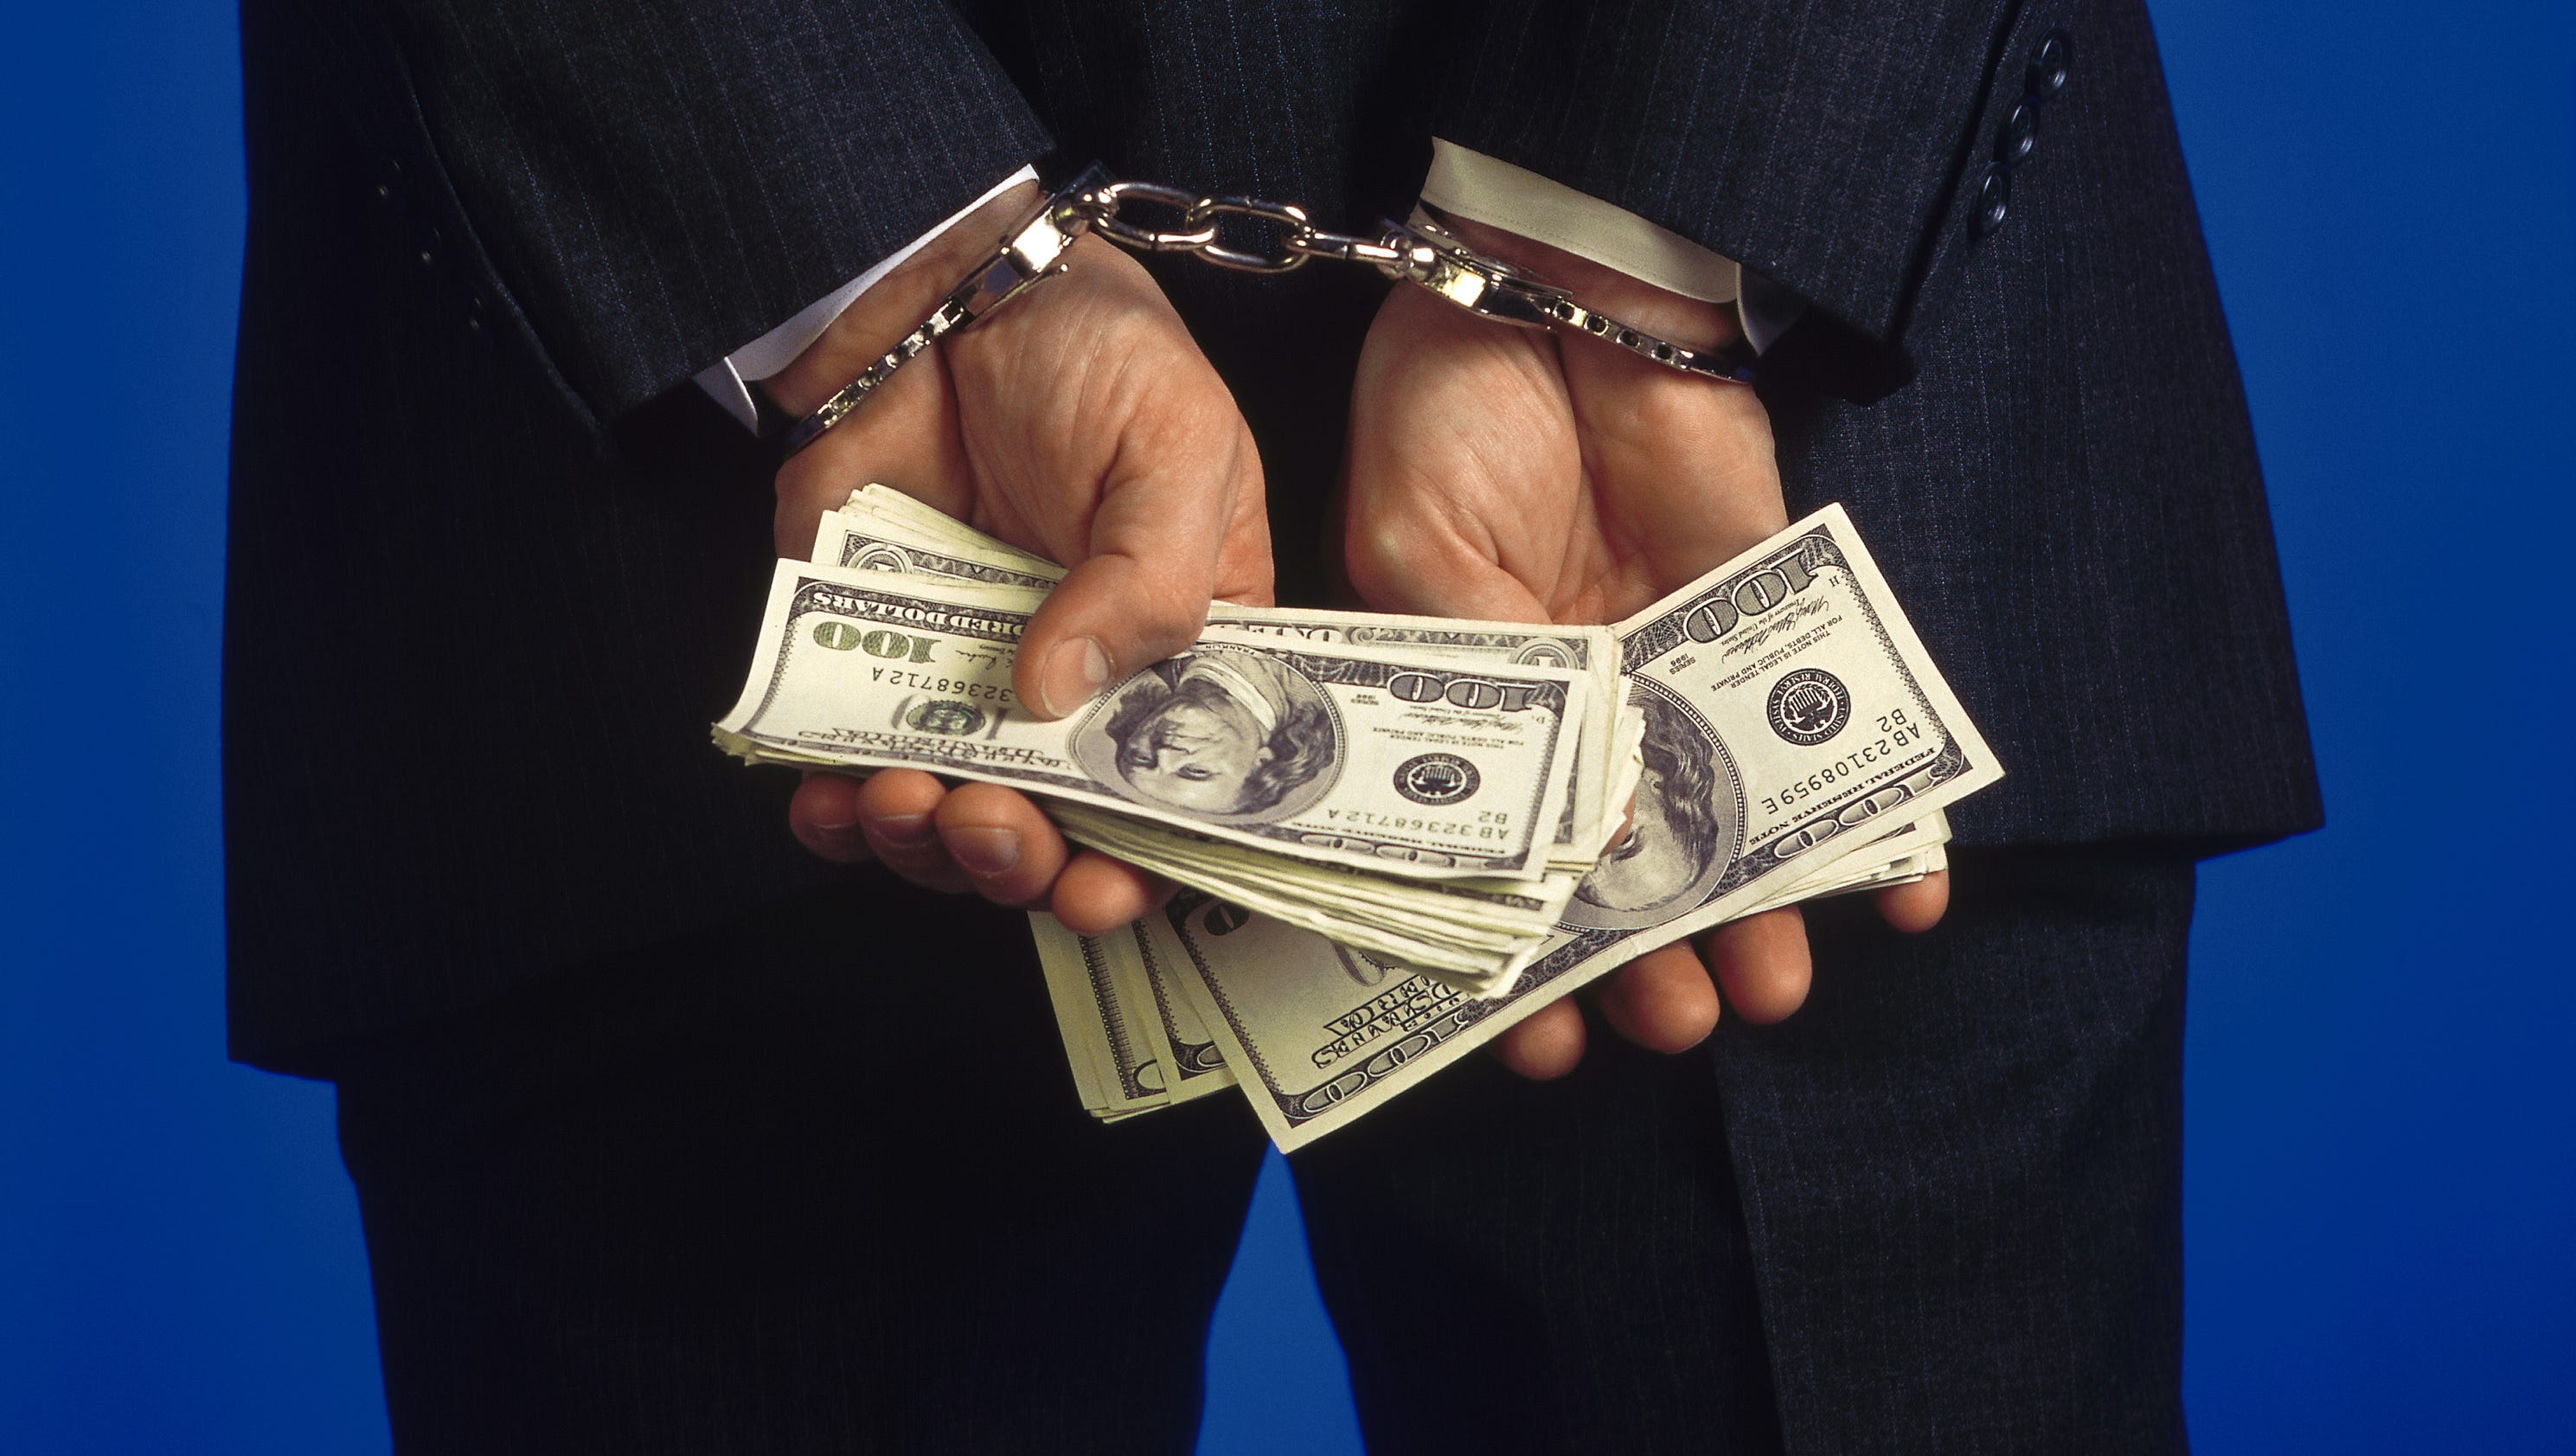 Quick cash loans wichita ks picture 1